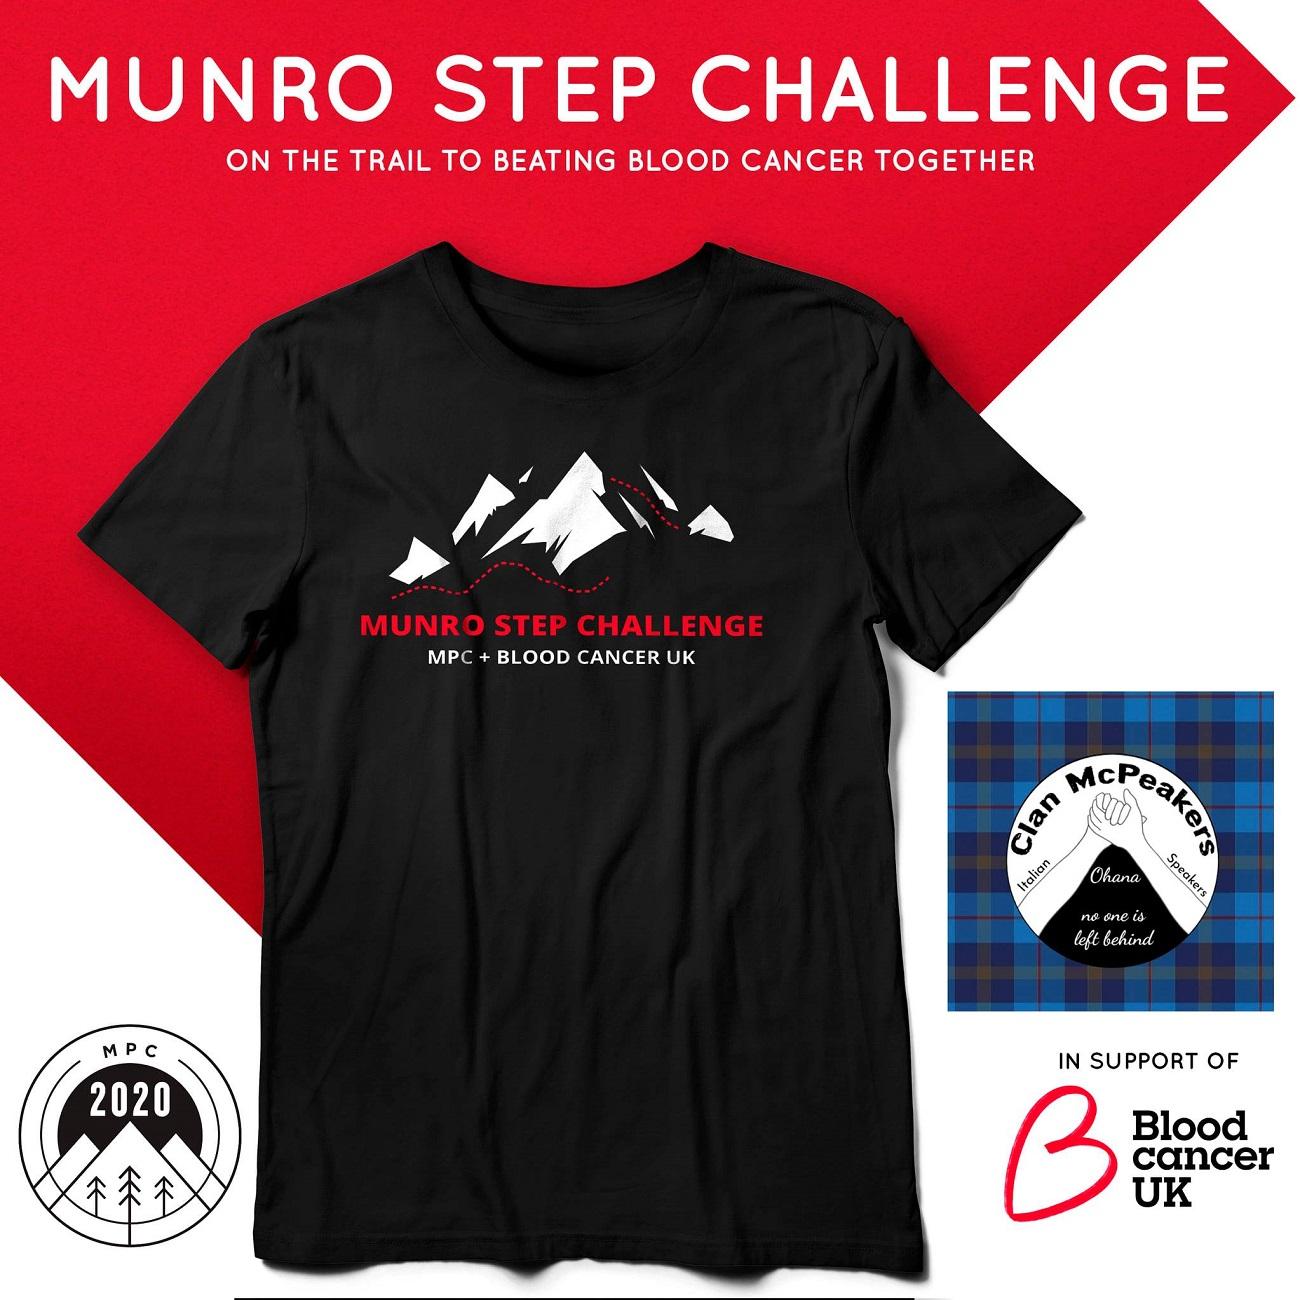 My Peak Challenge - Munro Step Challenge 2020